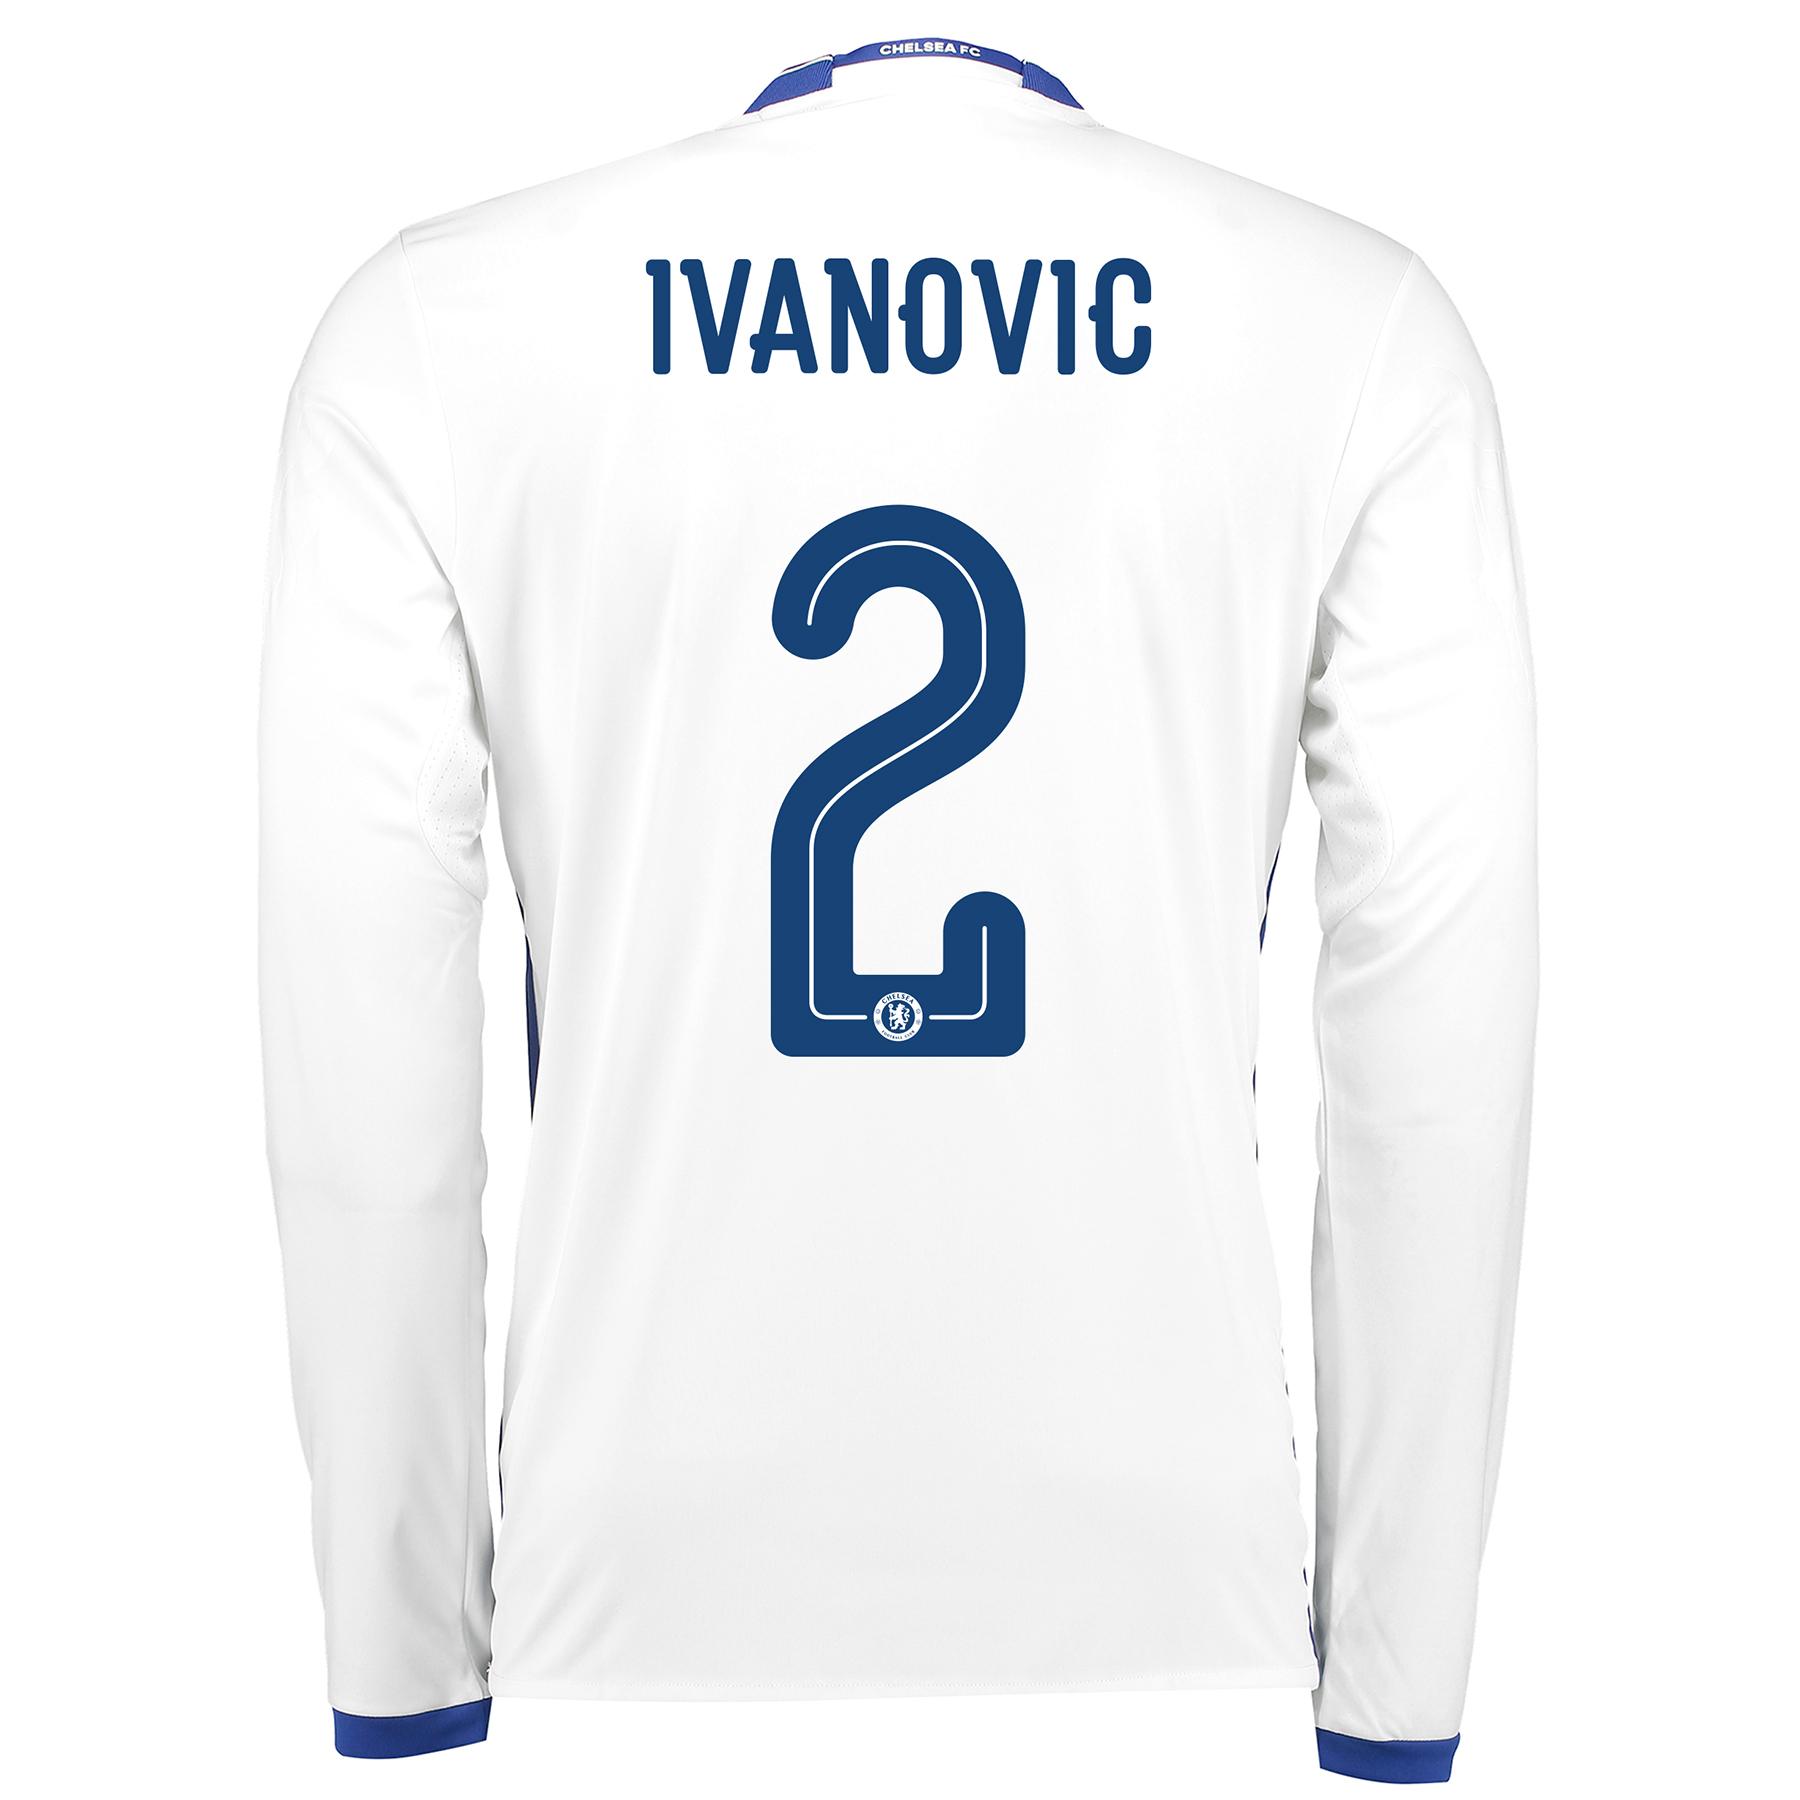 Chelsea Linear Third Shirt 16-17 - Long Sleeve with Ivanovic 2 printin